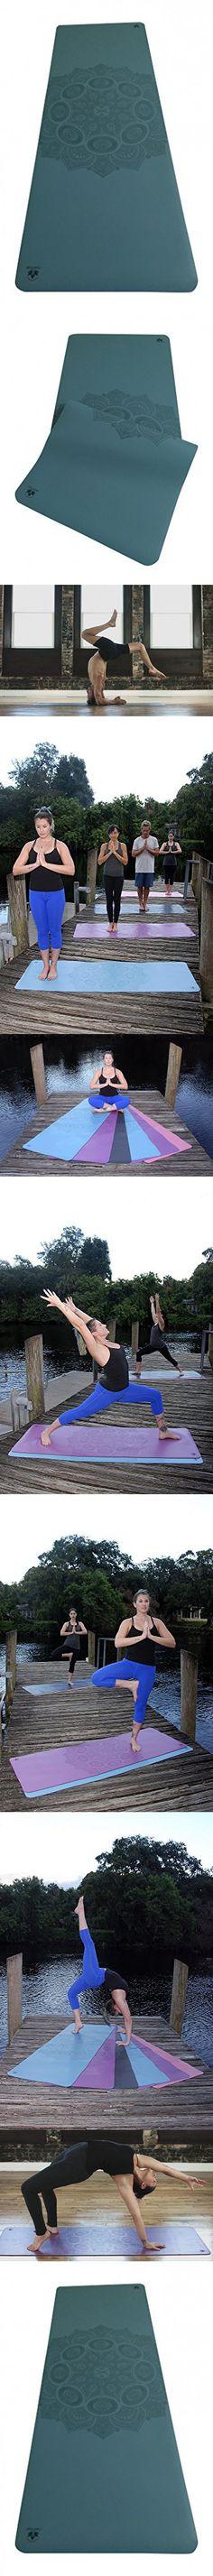 Clever Yoga Premium LiquidBalance Mat Eco and Body Friendly Sweat Grip Non-Slip With Carrying Yoga Bag (Mandala-Blue)